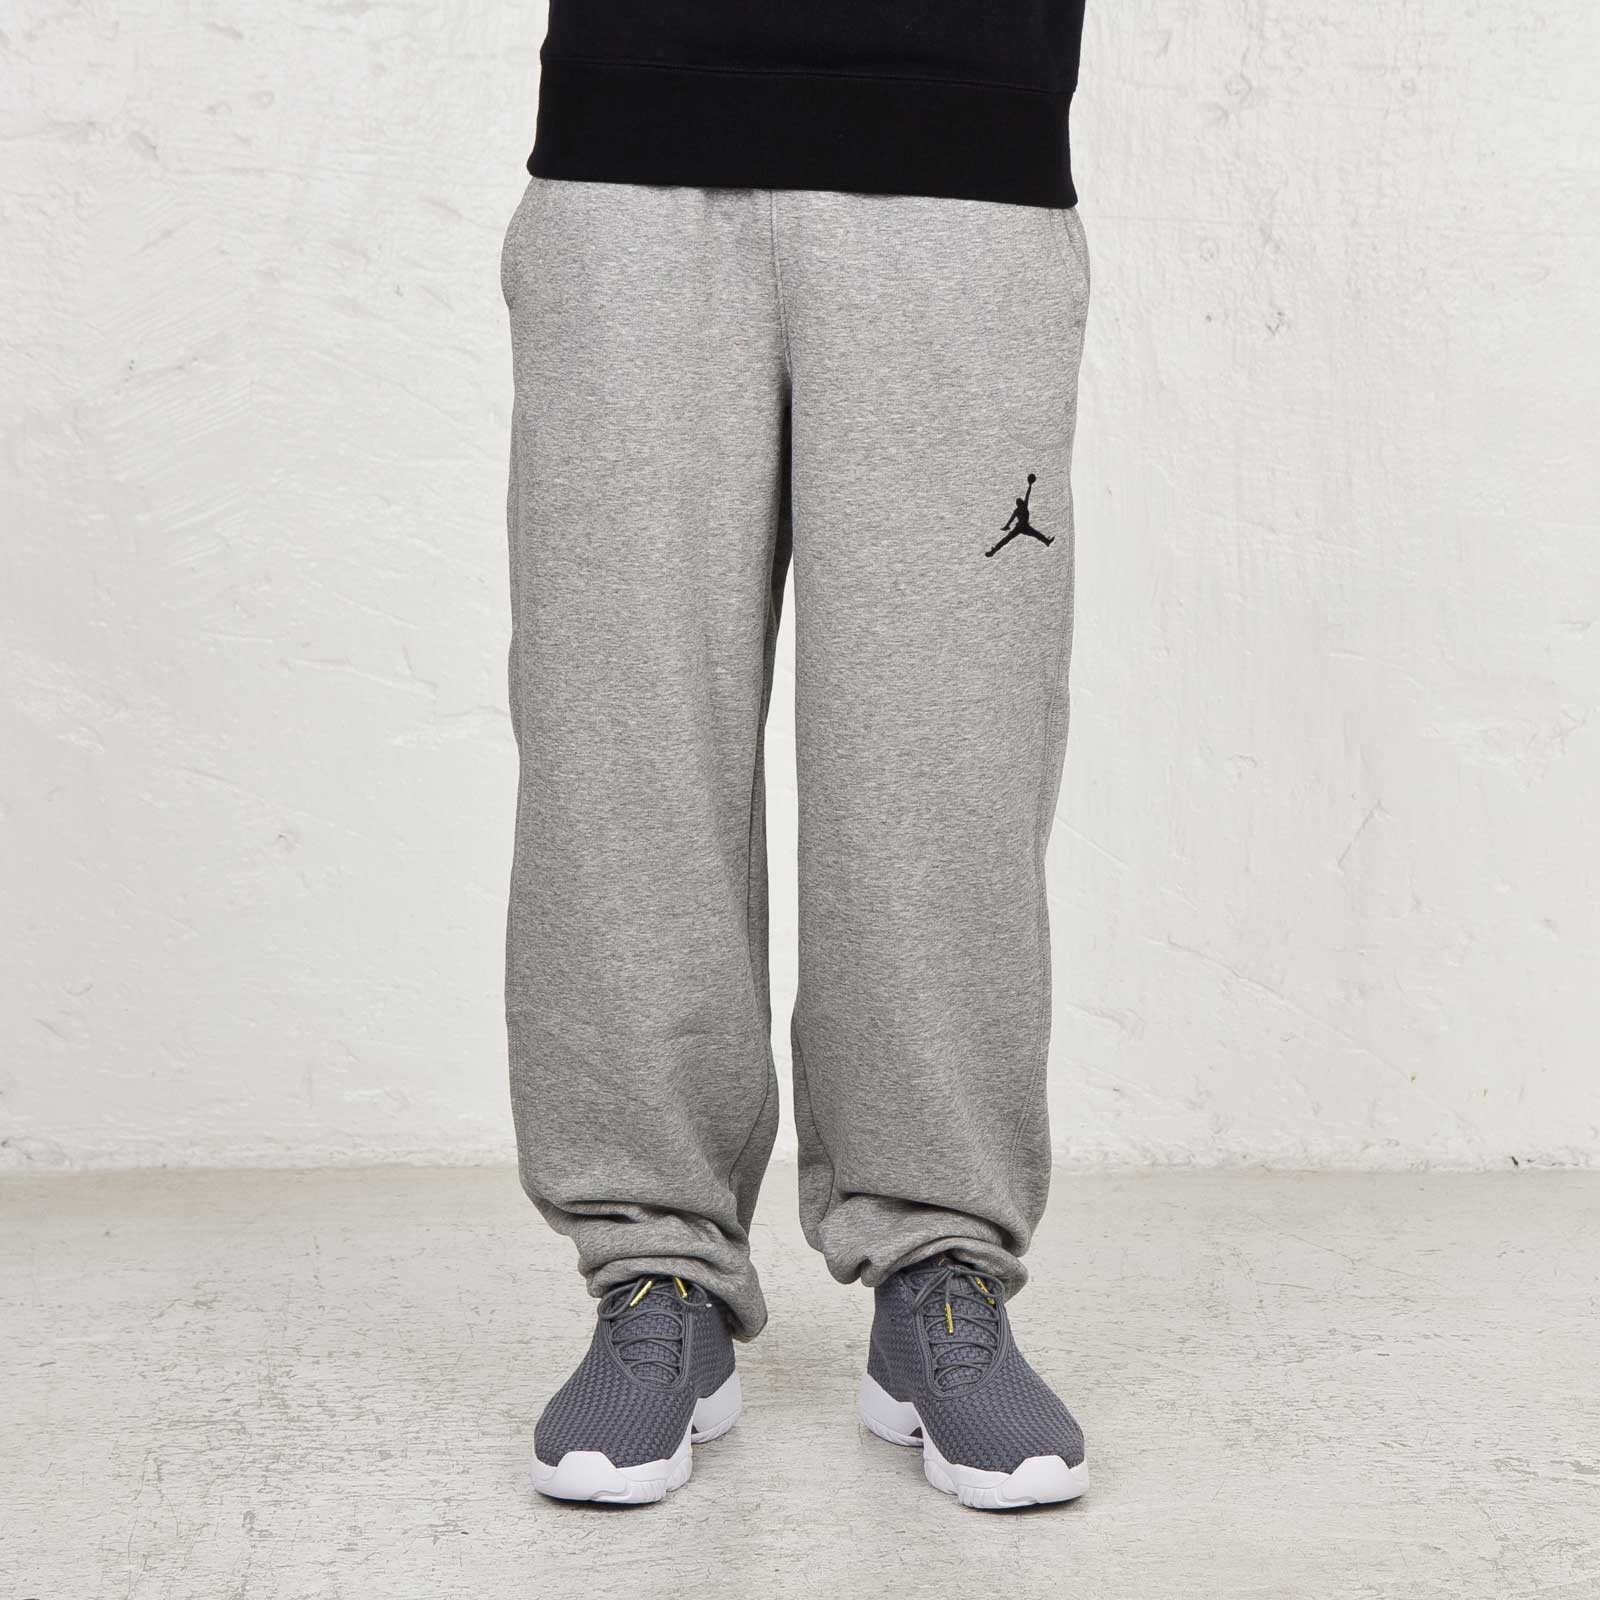 25fc85b5b22 Jordan Brand 23/7 Fleece Pant - 547662-063 - Sneakersnstuff ...